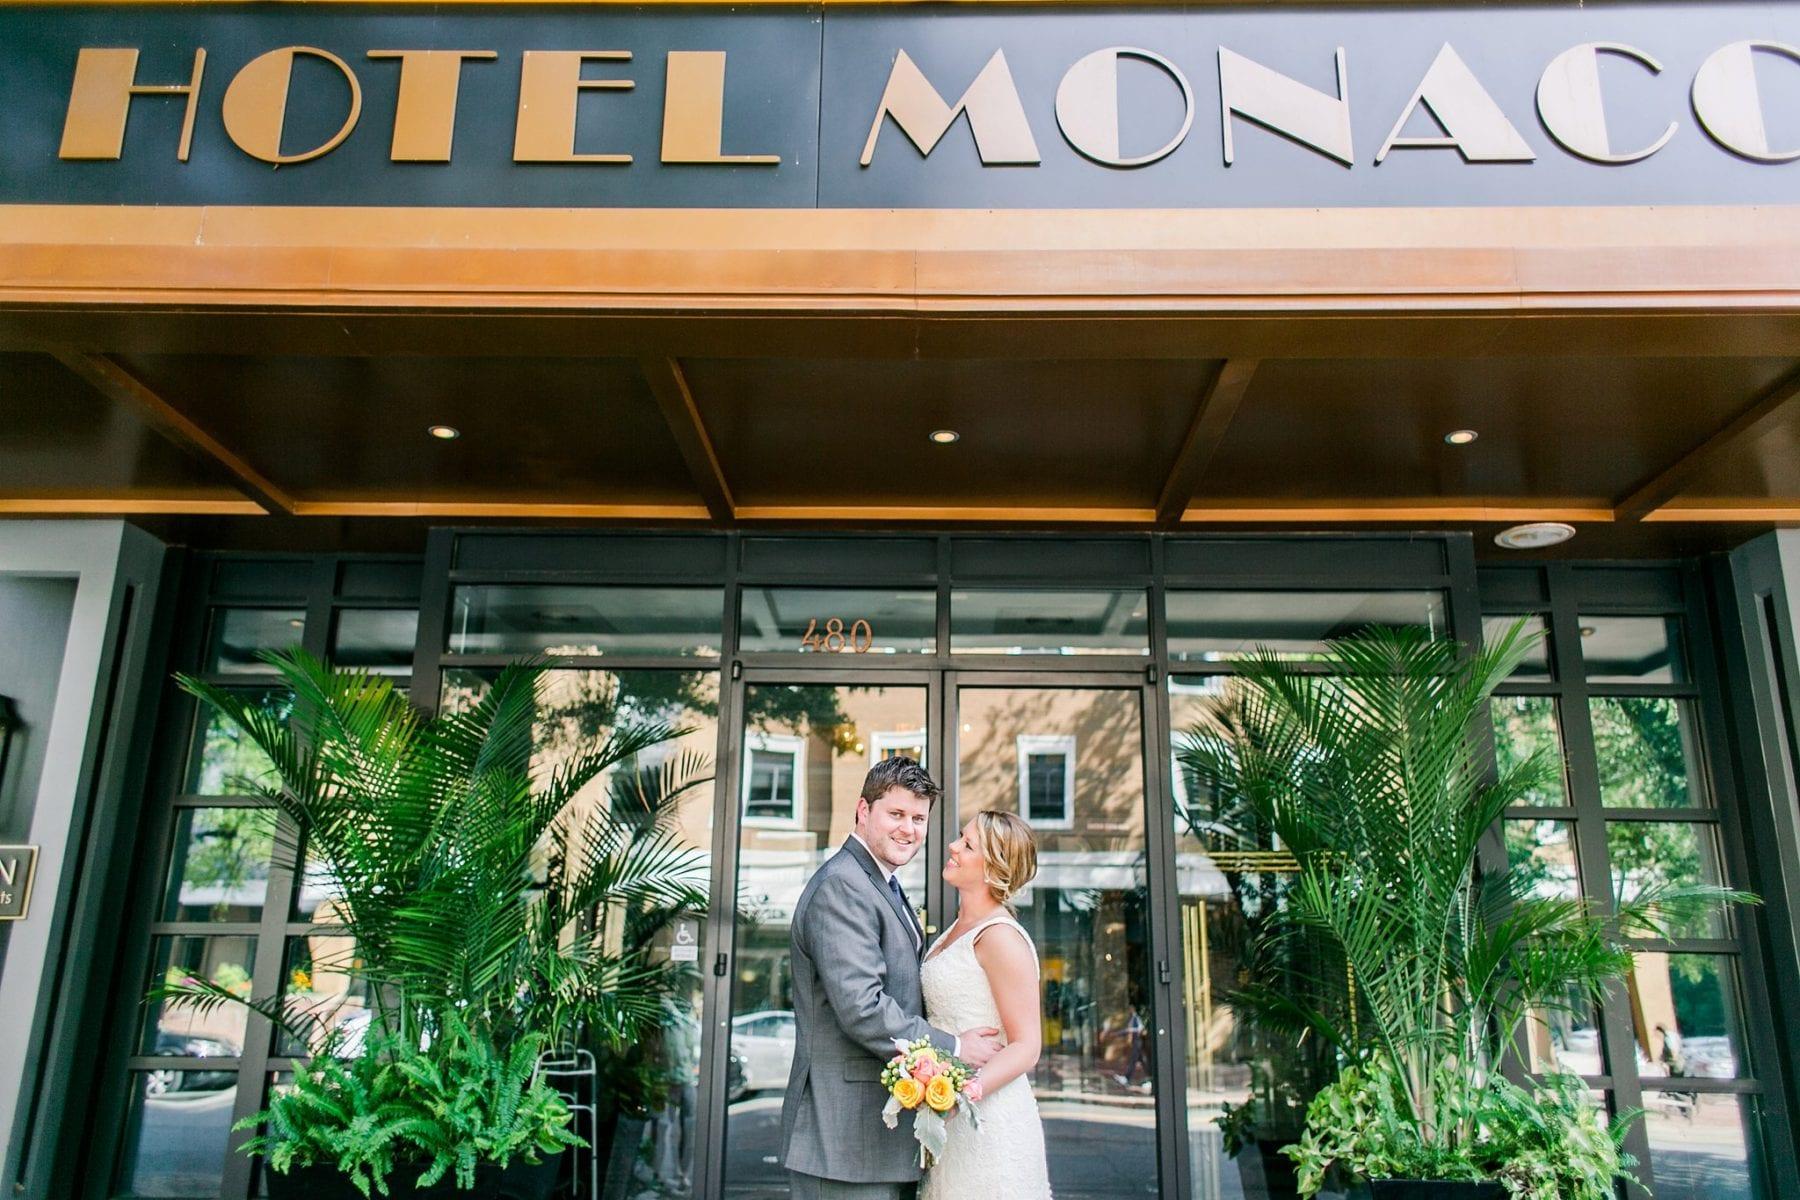 Hotel Monaco Wedding Photos Virginia Wedding Photographer Megan Kelsey Photography Kevin & Morgan-254.JPG